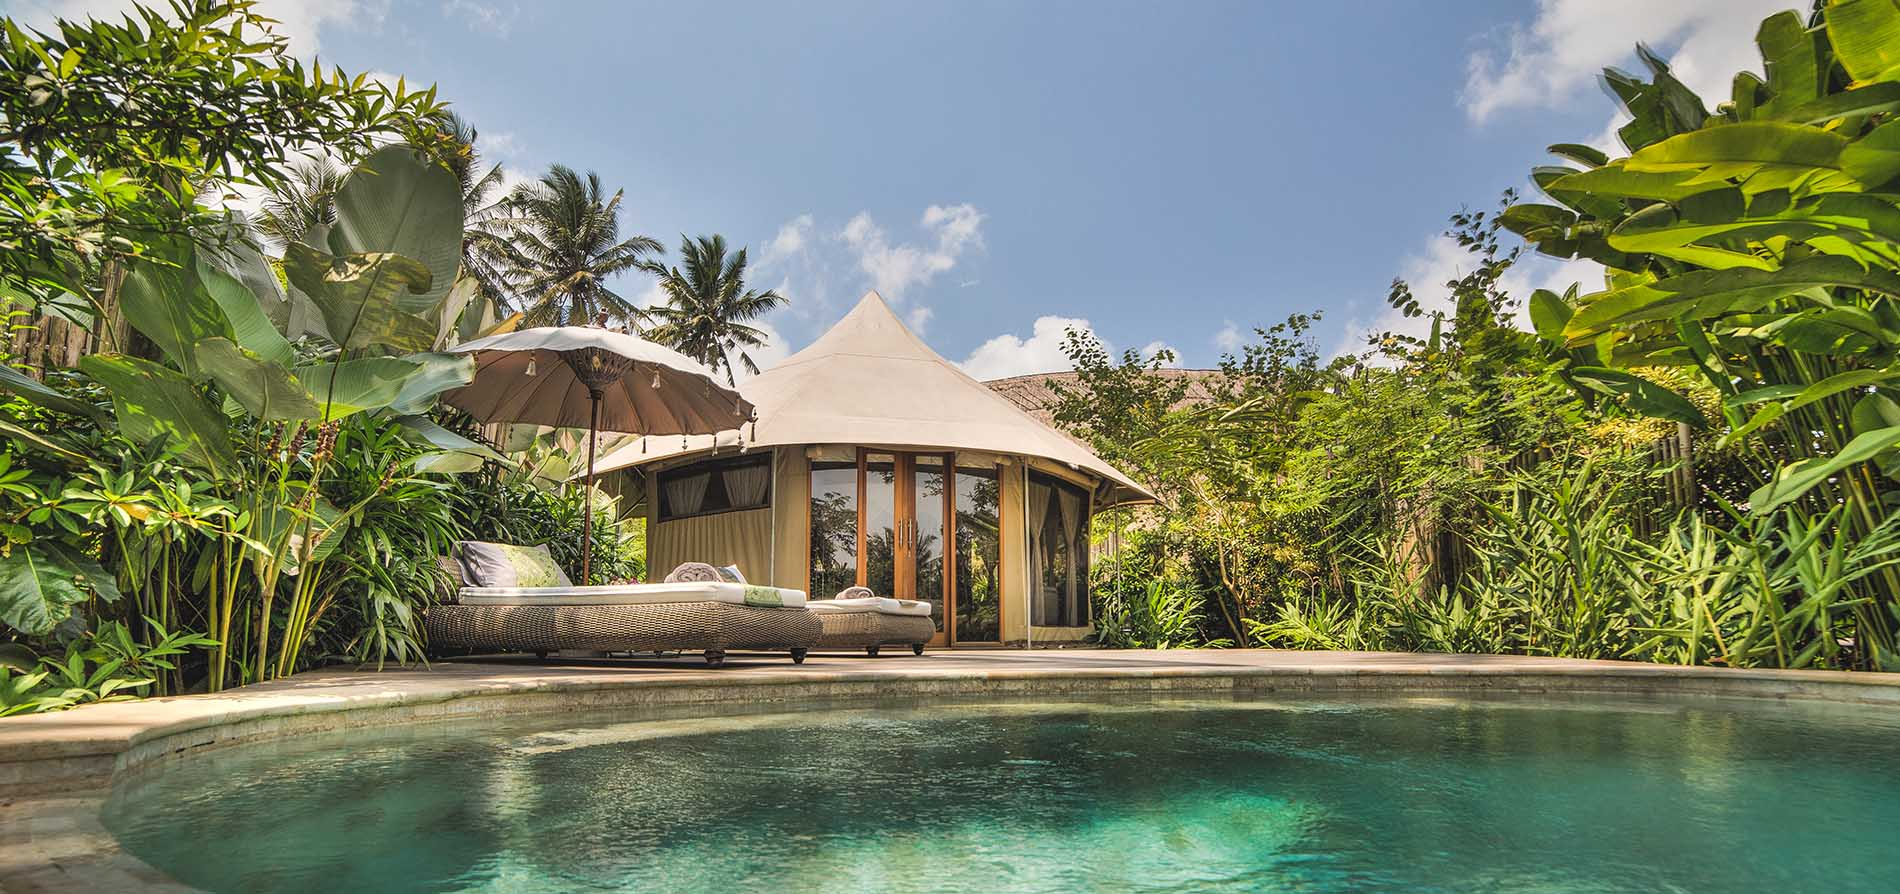 SiteMinder 15 year Anniversary, Sandat Glamping, Bali, ecotourism, eco-travel, sustainable travel, ethical travel, zero impact travel, sustainable tourism, ethical tourism, zero impact tourism, sustainable traveller, ethical traveller